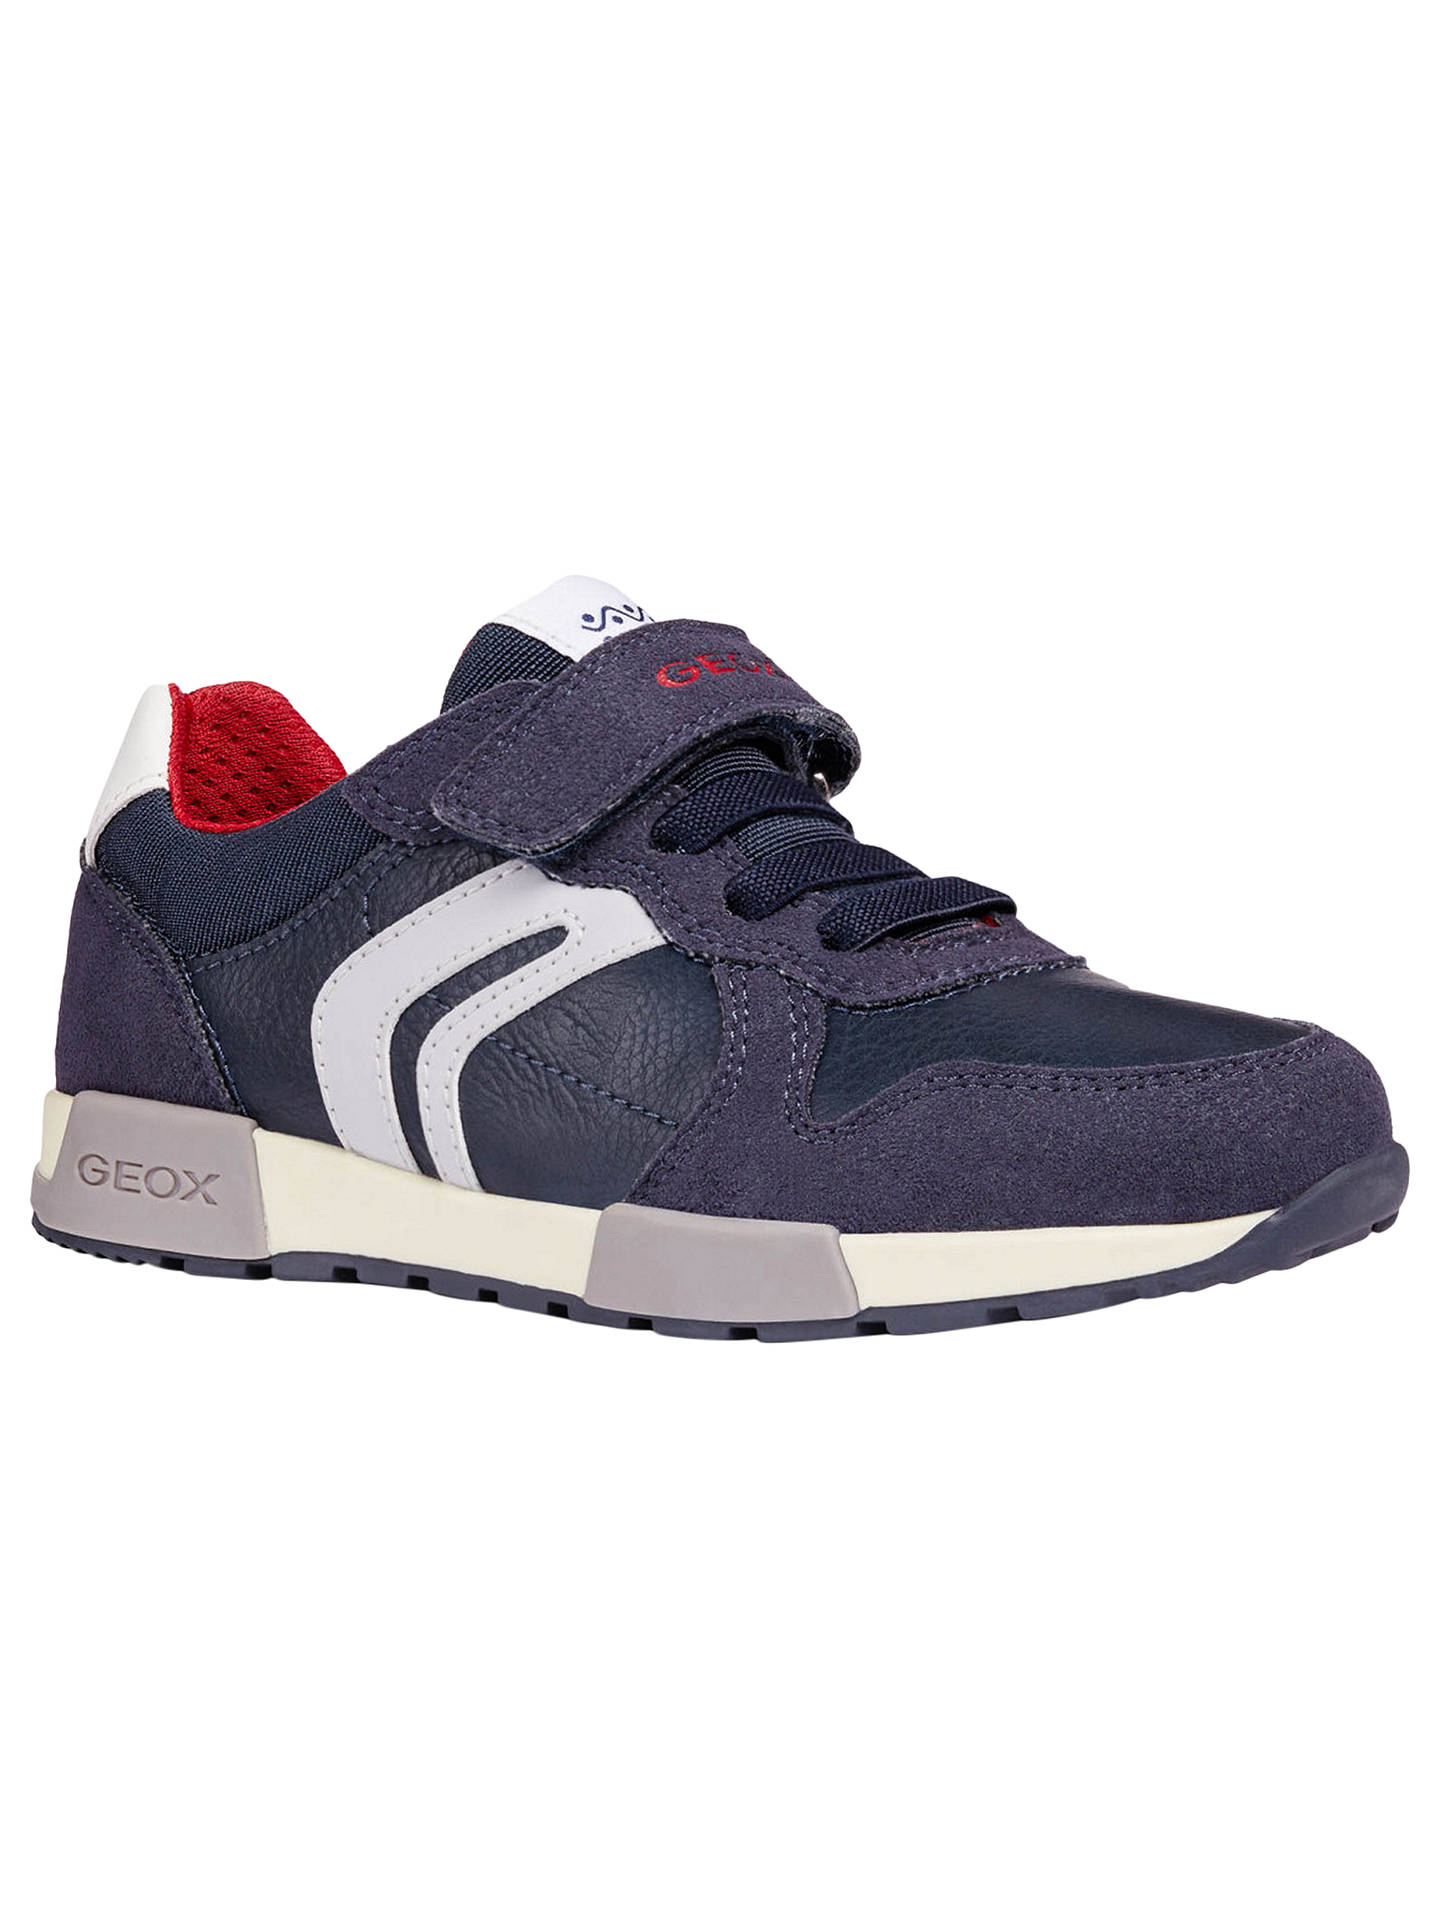 superior quality c66dd a3463 Geox Children's J Alfier Shoes, Blue at John Lewis & Partners